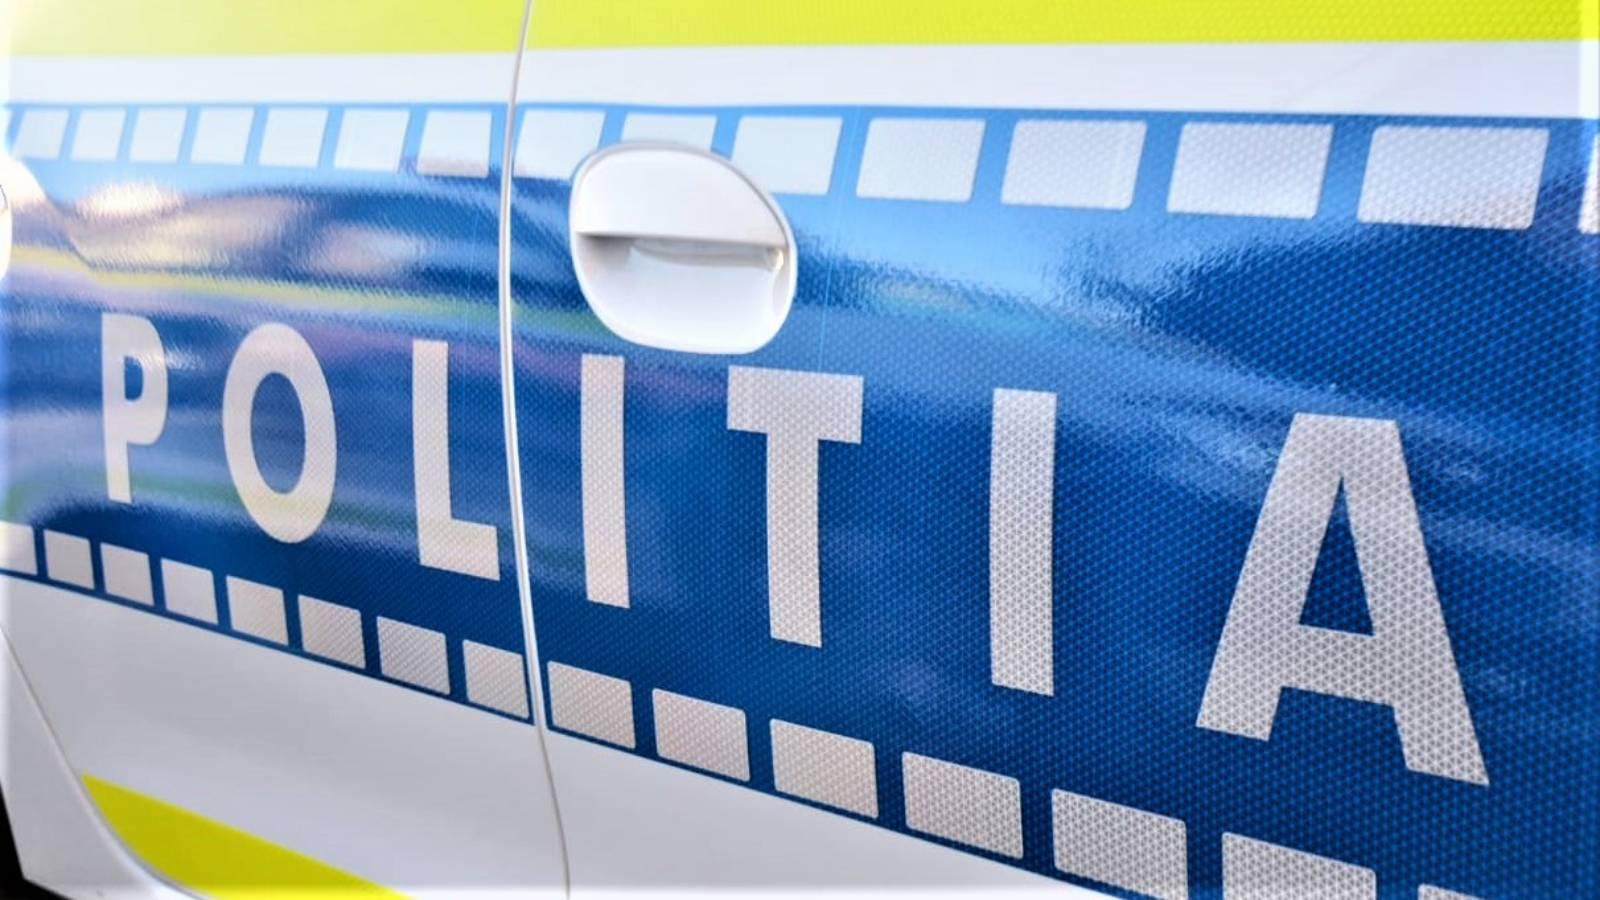 Politia Romana avertismentul pericolele mediul online